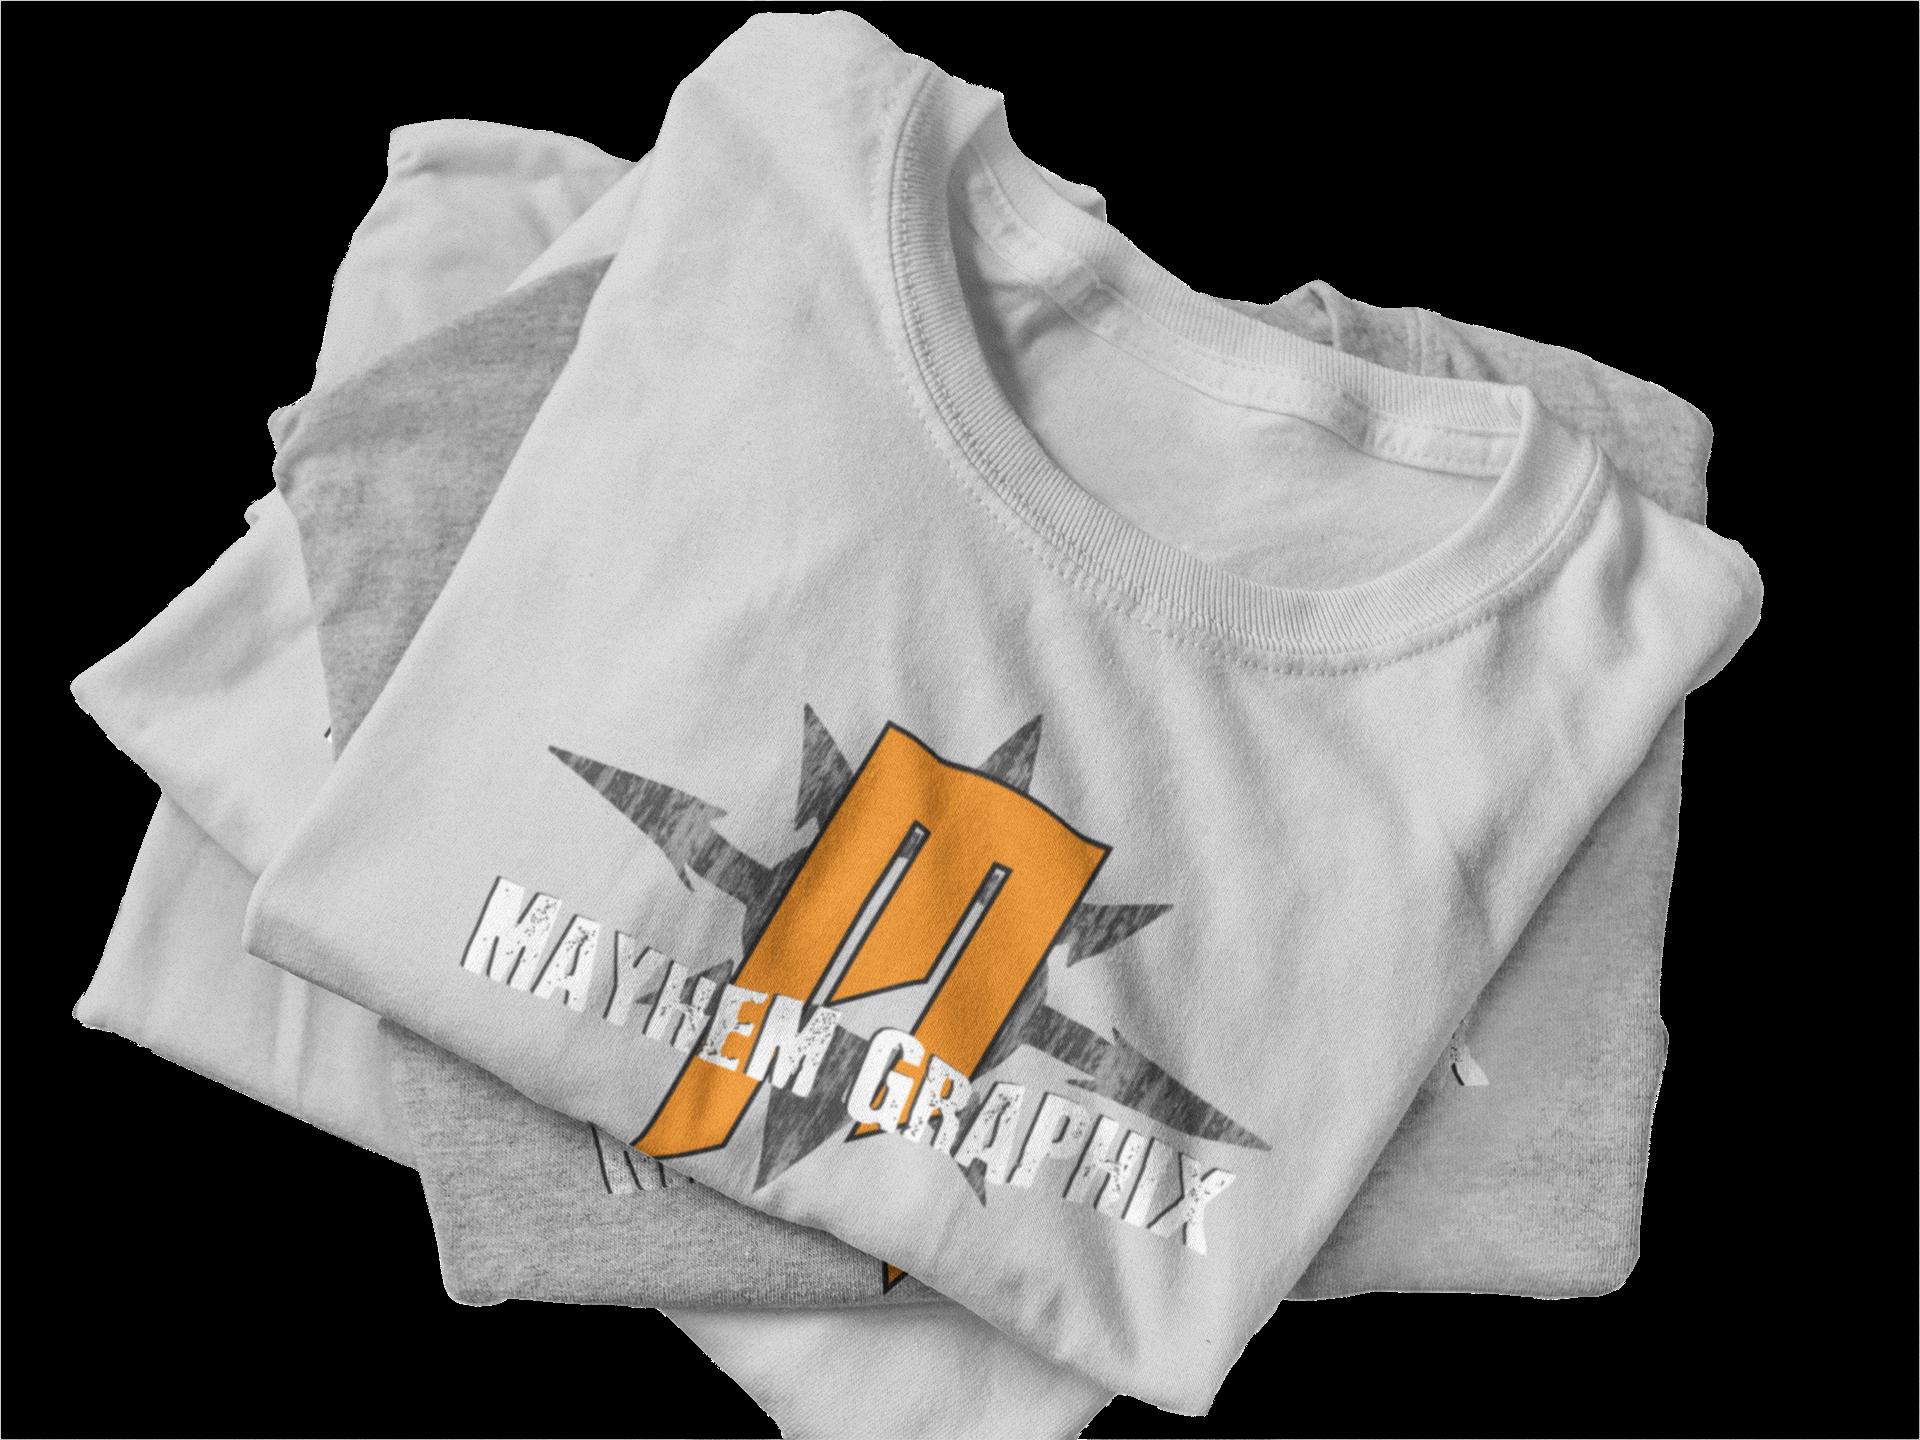 Stack of Mayhem Graphix t-shirts